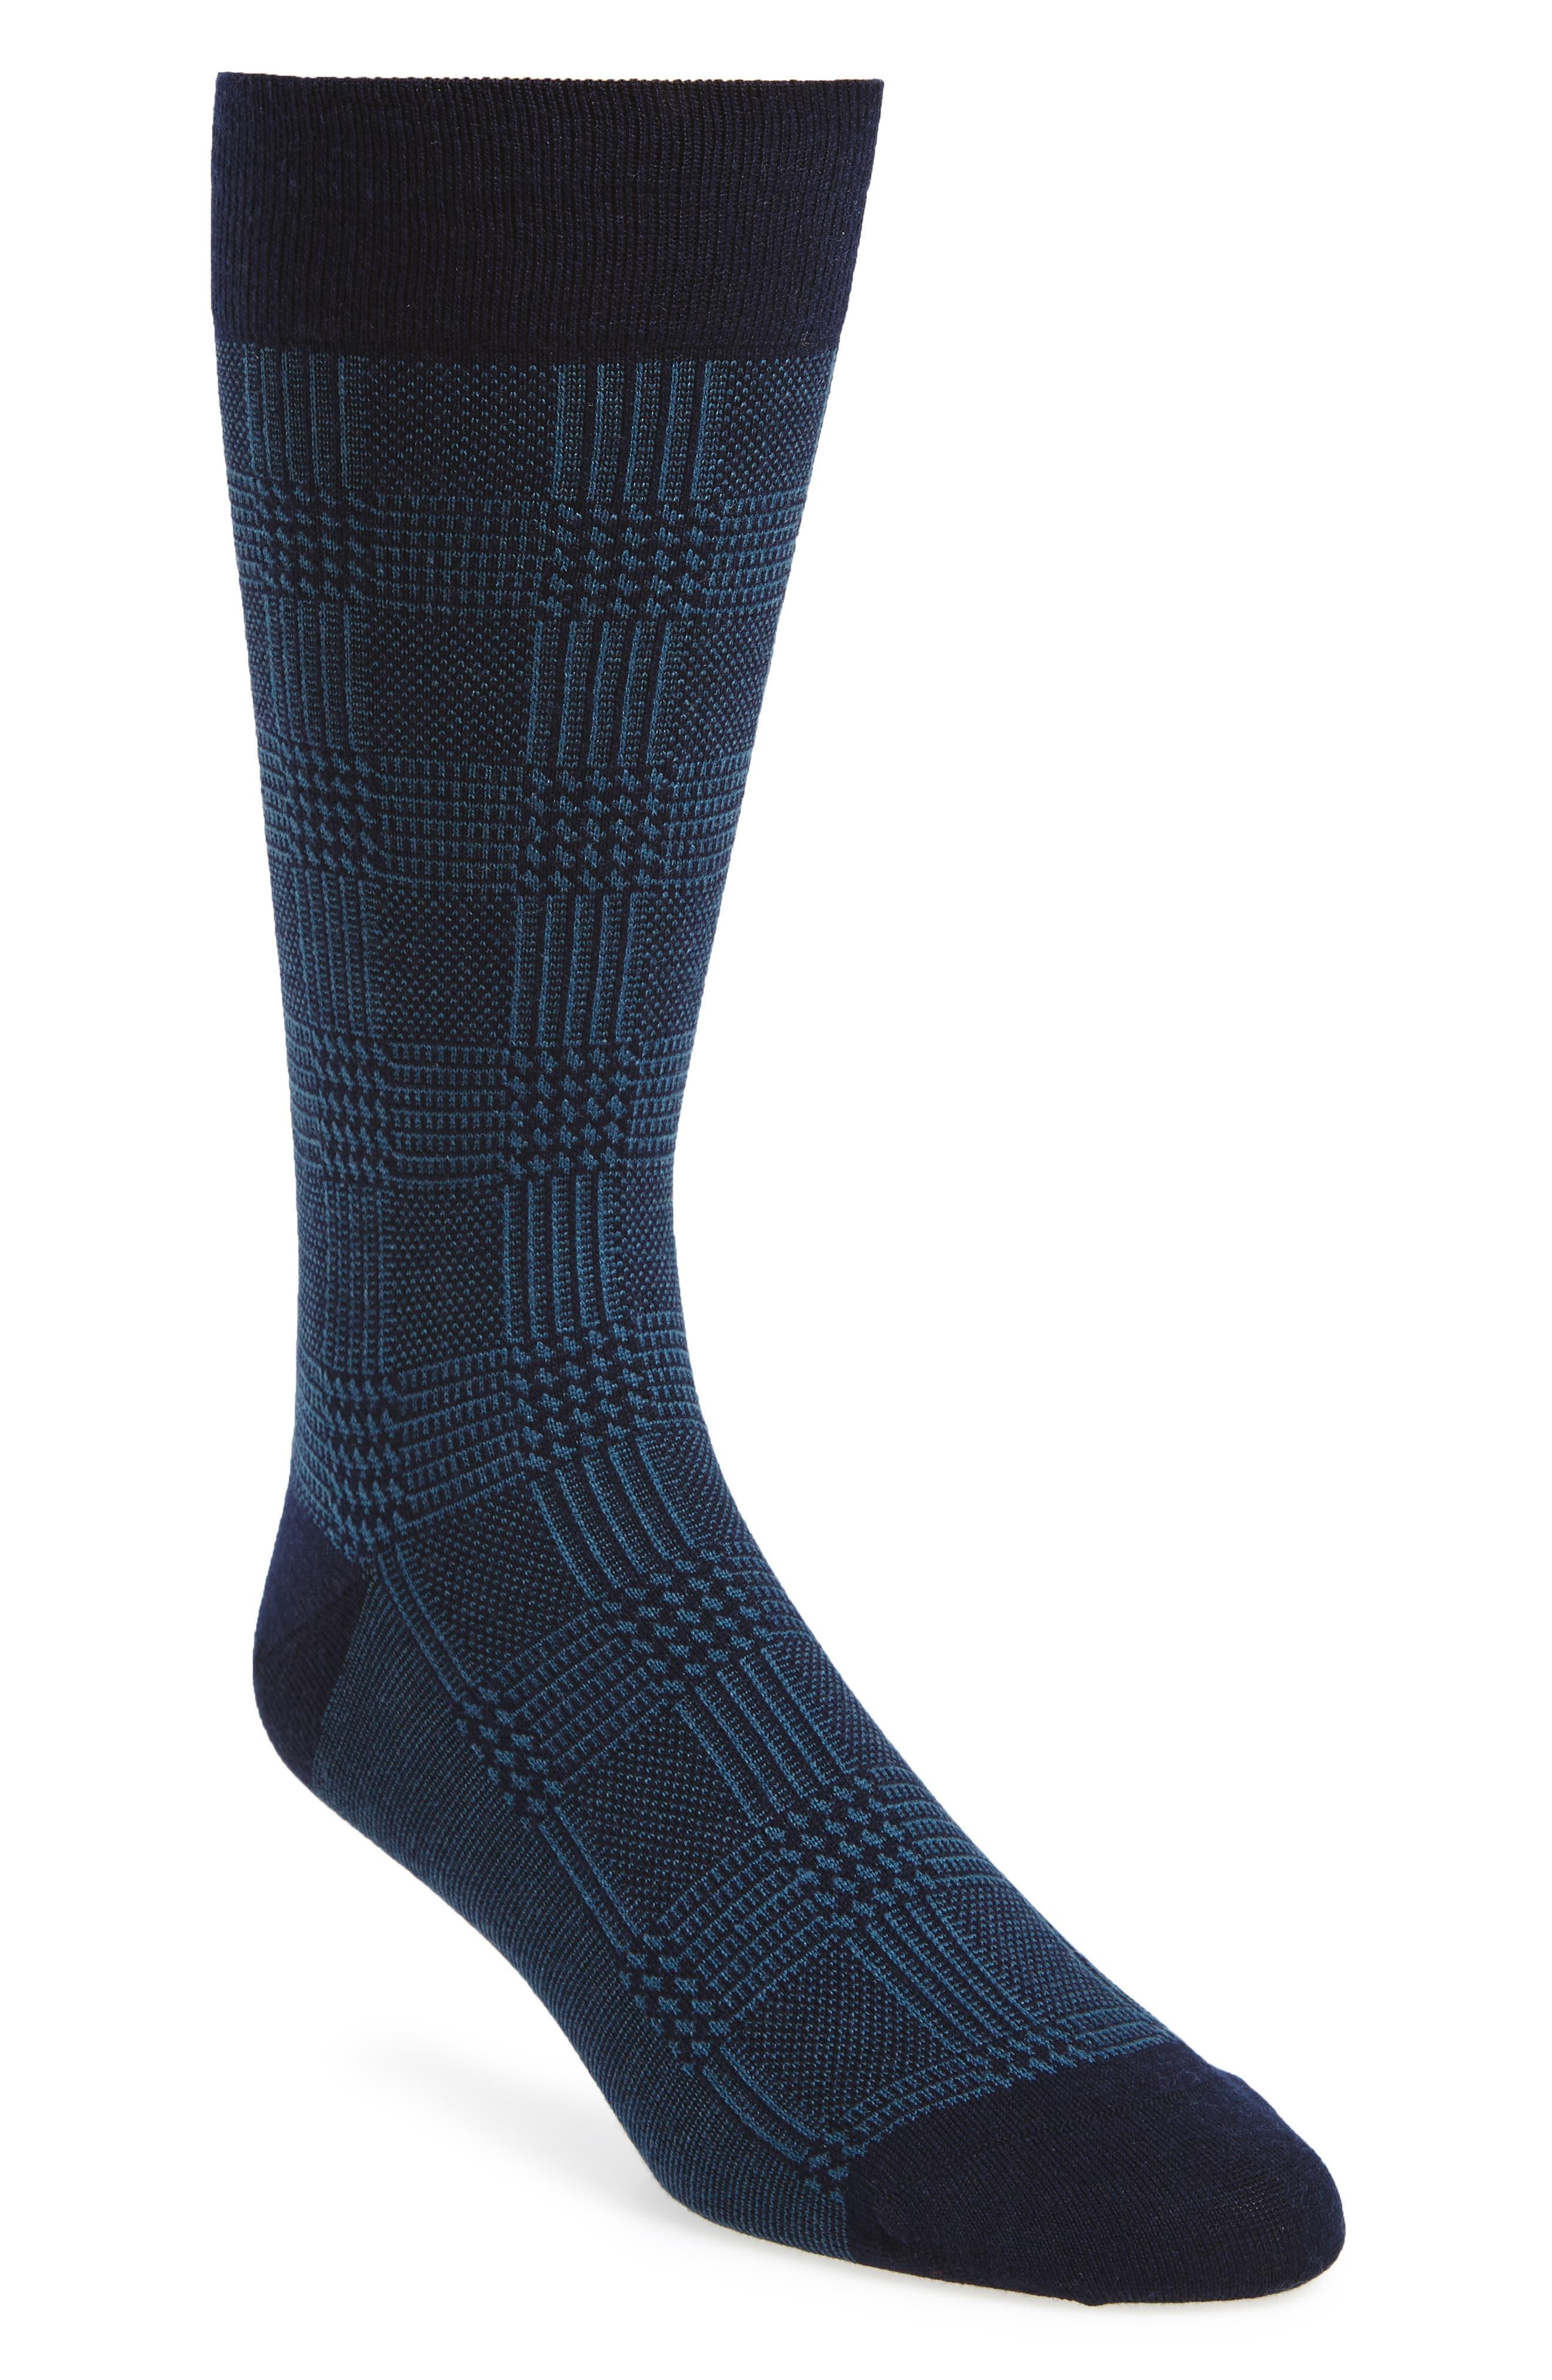 Alternate Image 1 Selected - Pantherella Plaid Wool Blend Socks